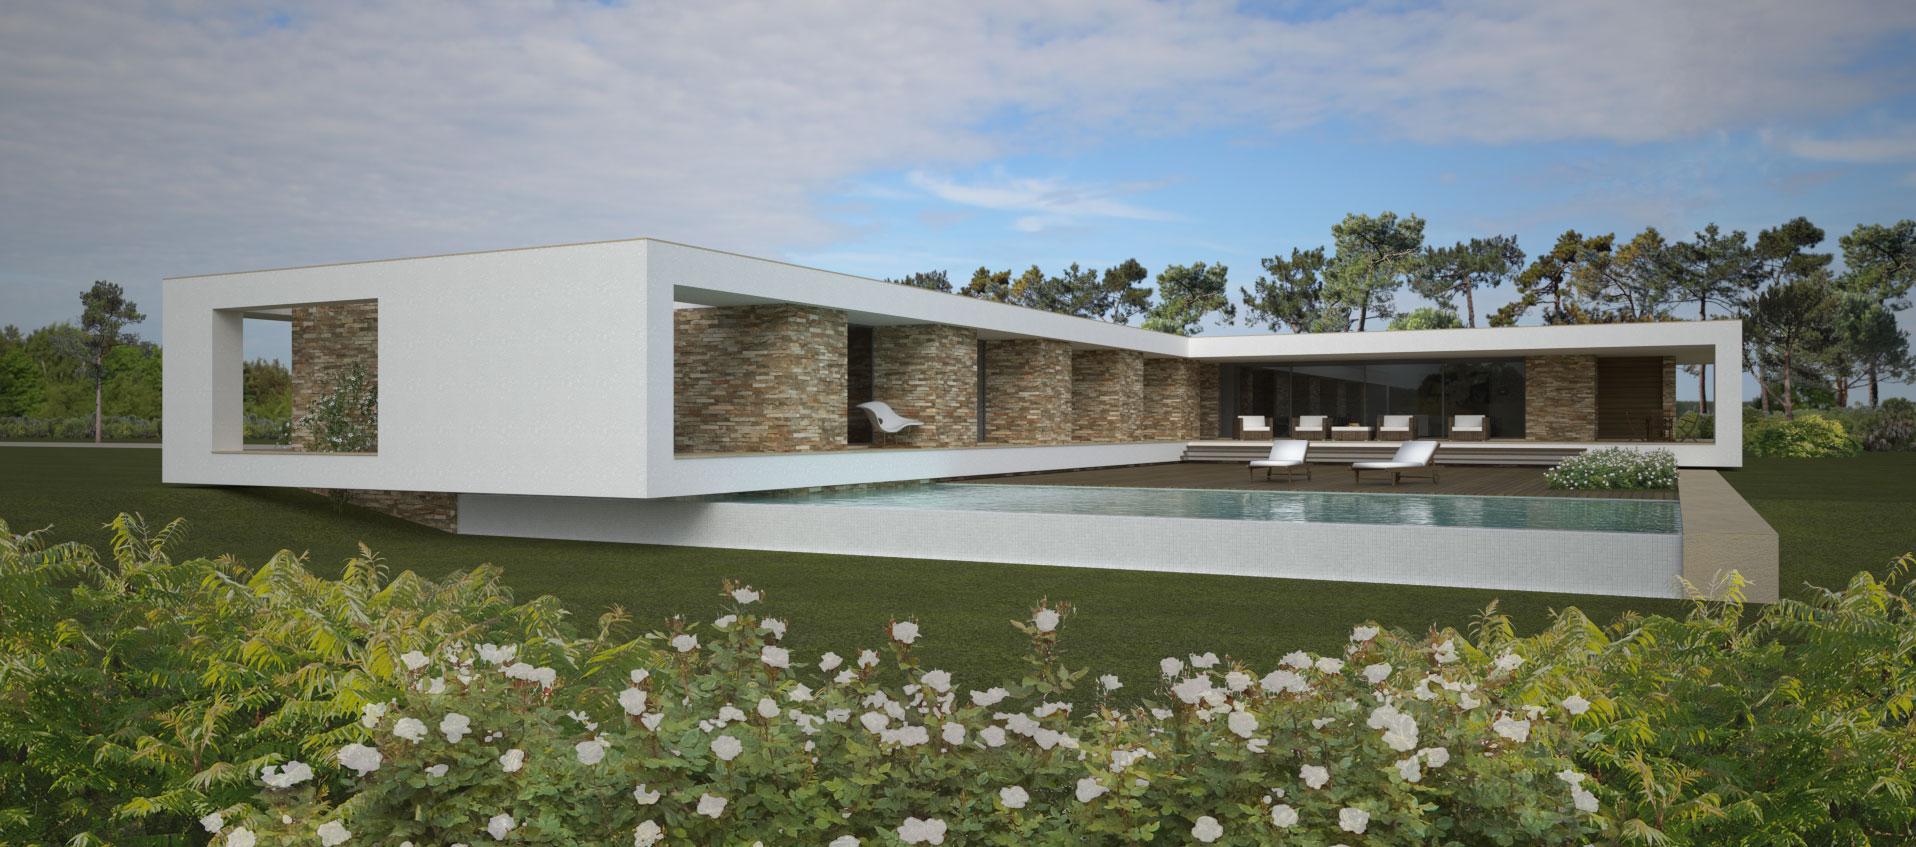 Sousa lopes arquitectos criamos projectos de arquitectura - Atelier arquitectura ...